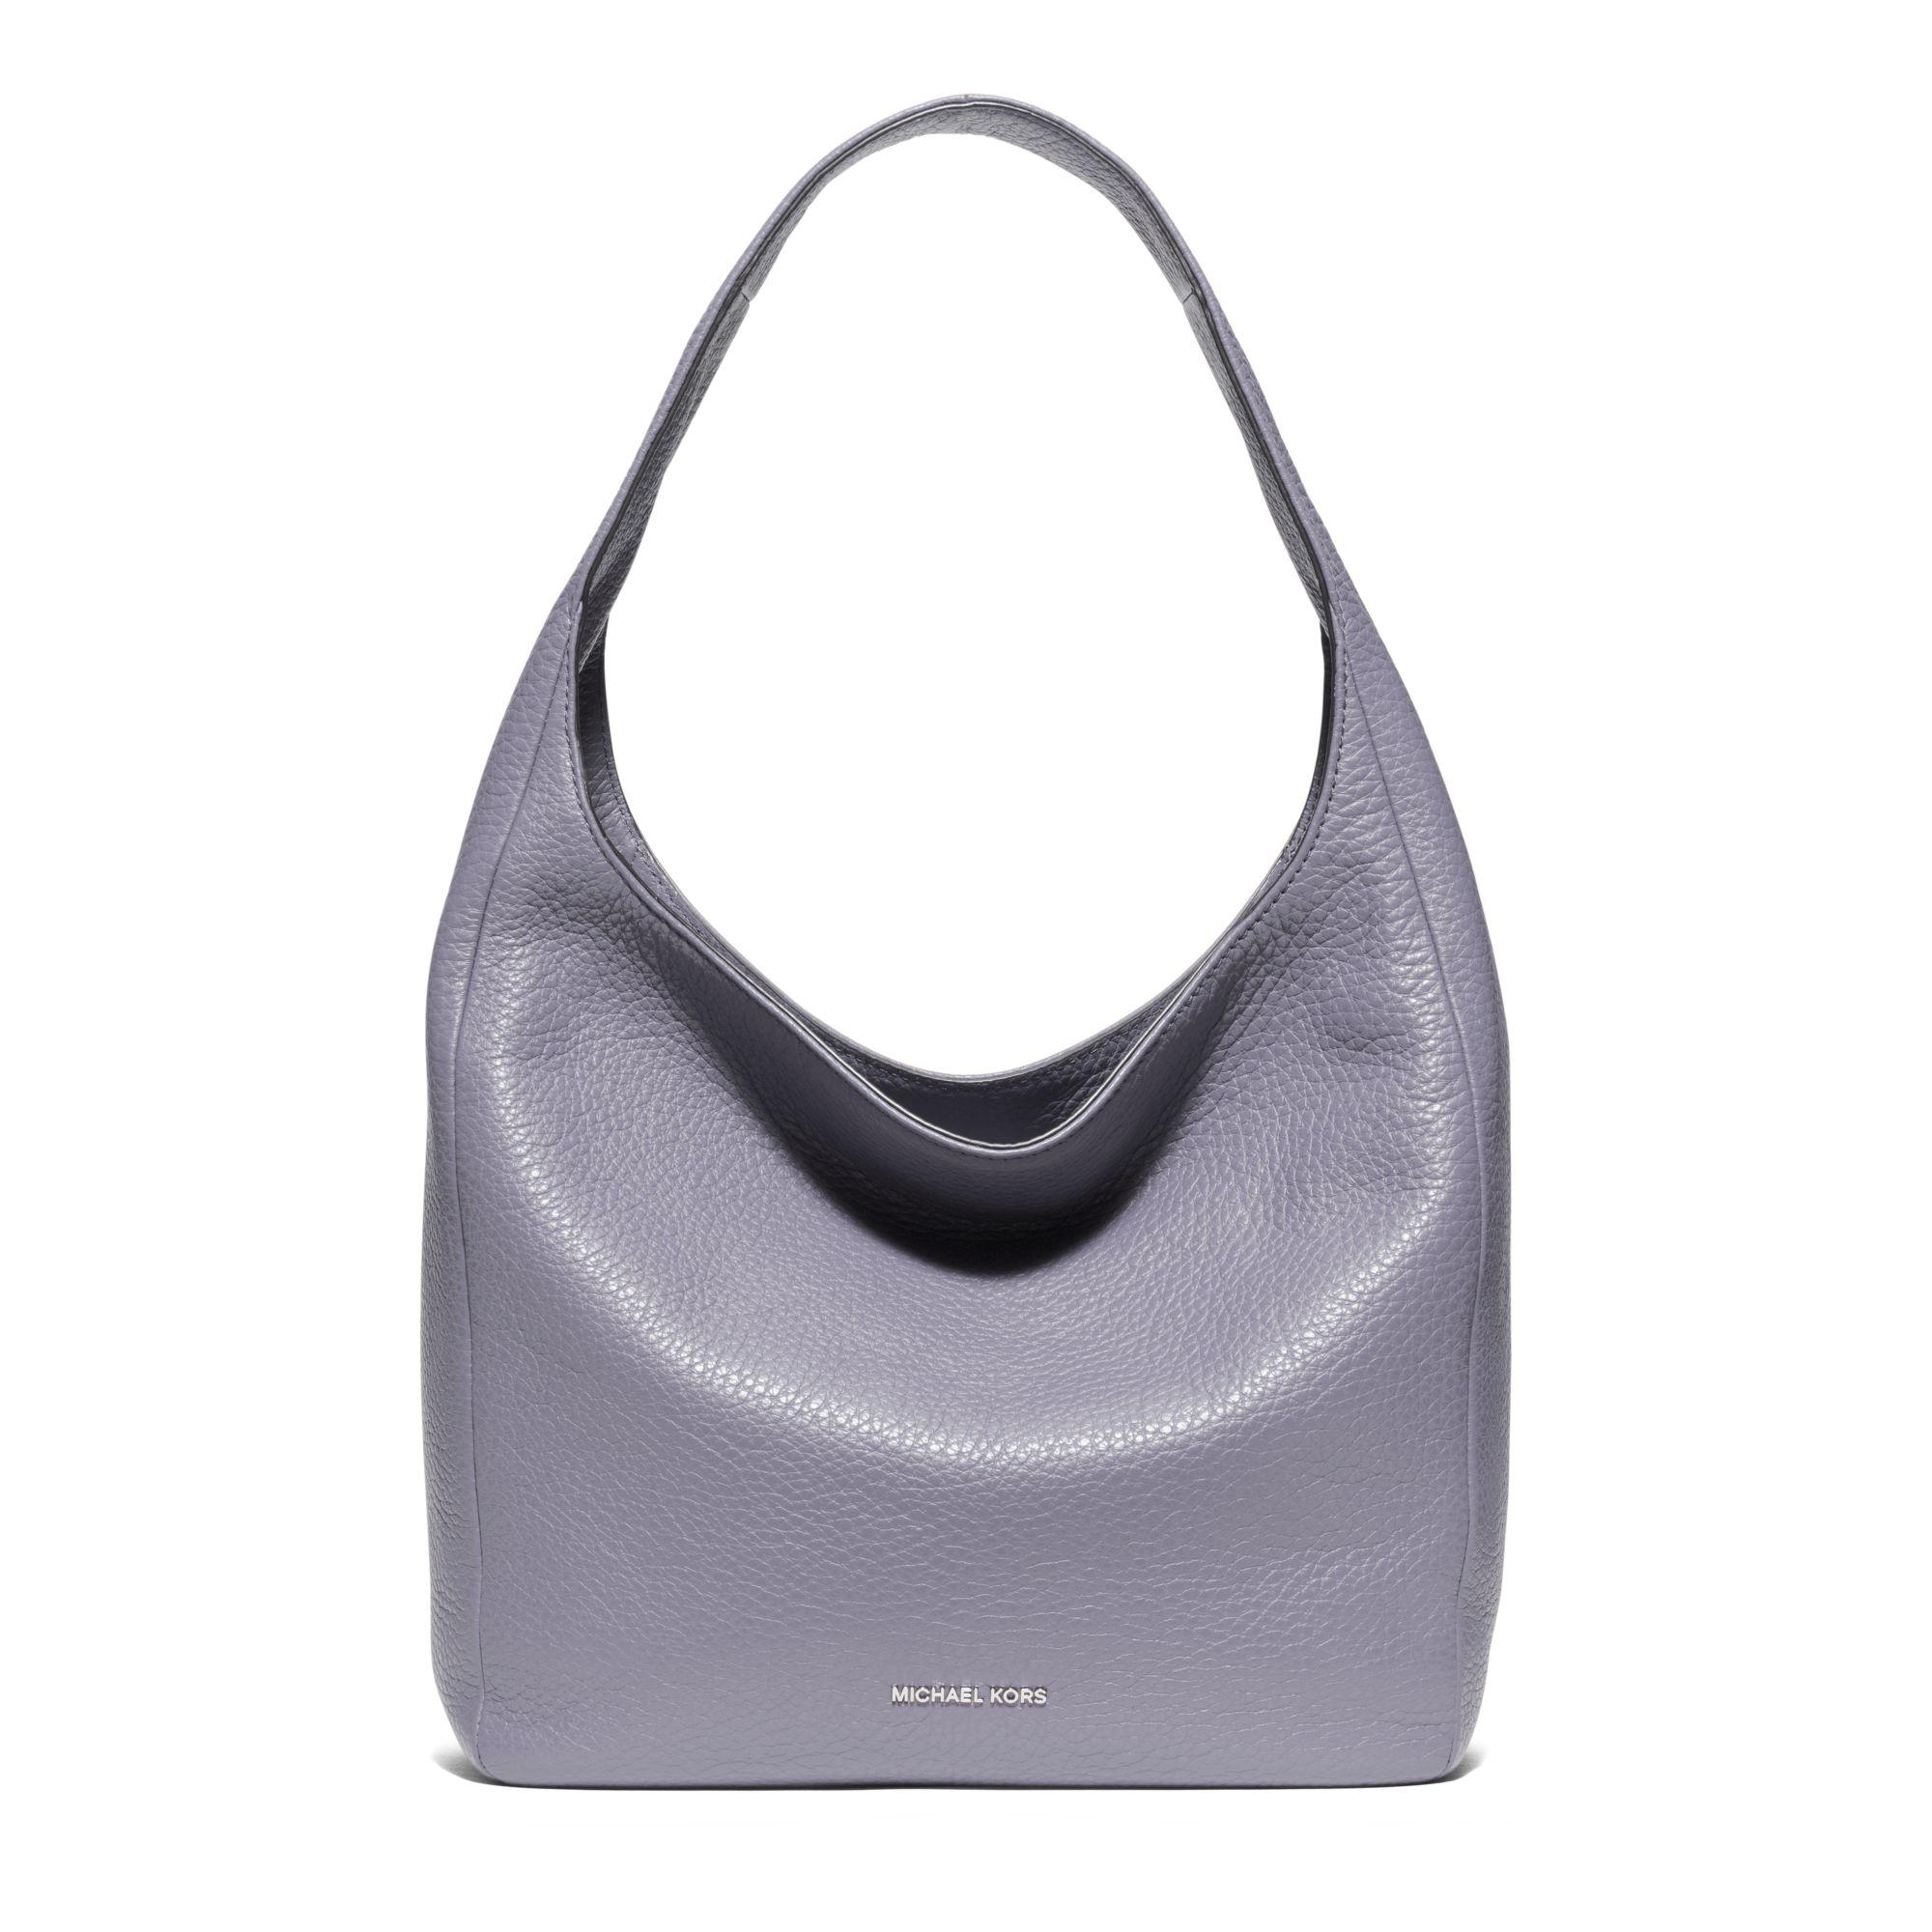 613f87d8e15d Lyst - Michael Kors Lena Large Leather Shoulder Bag in Gray